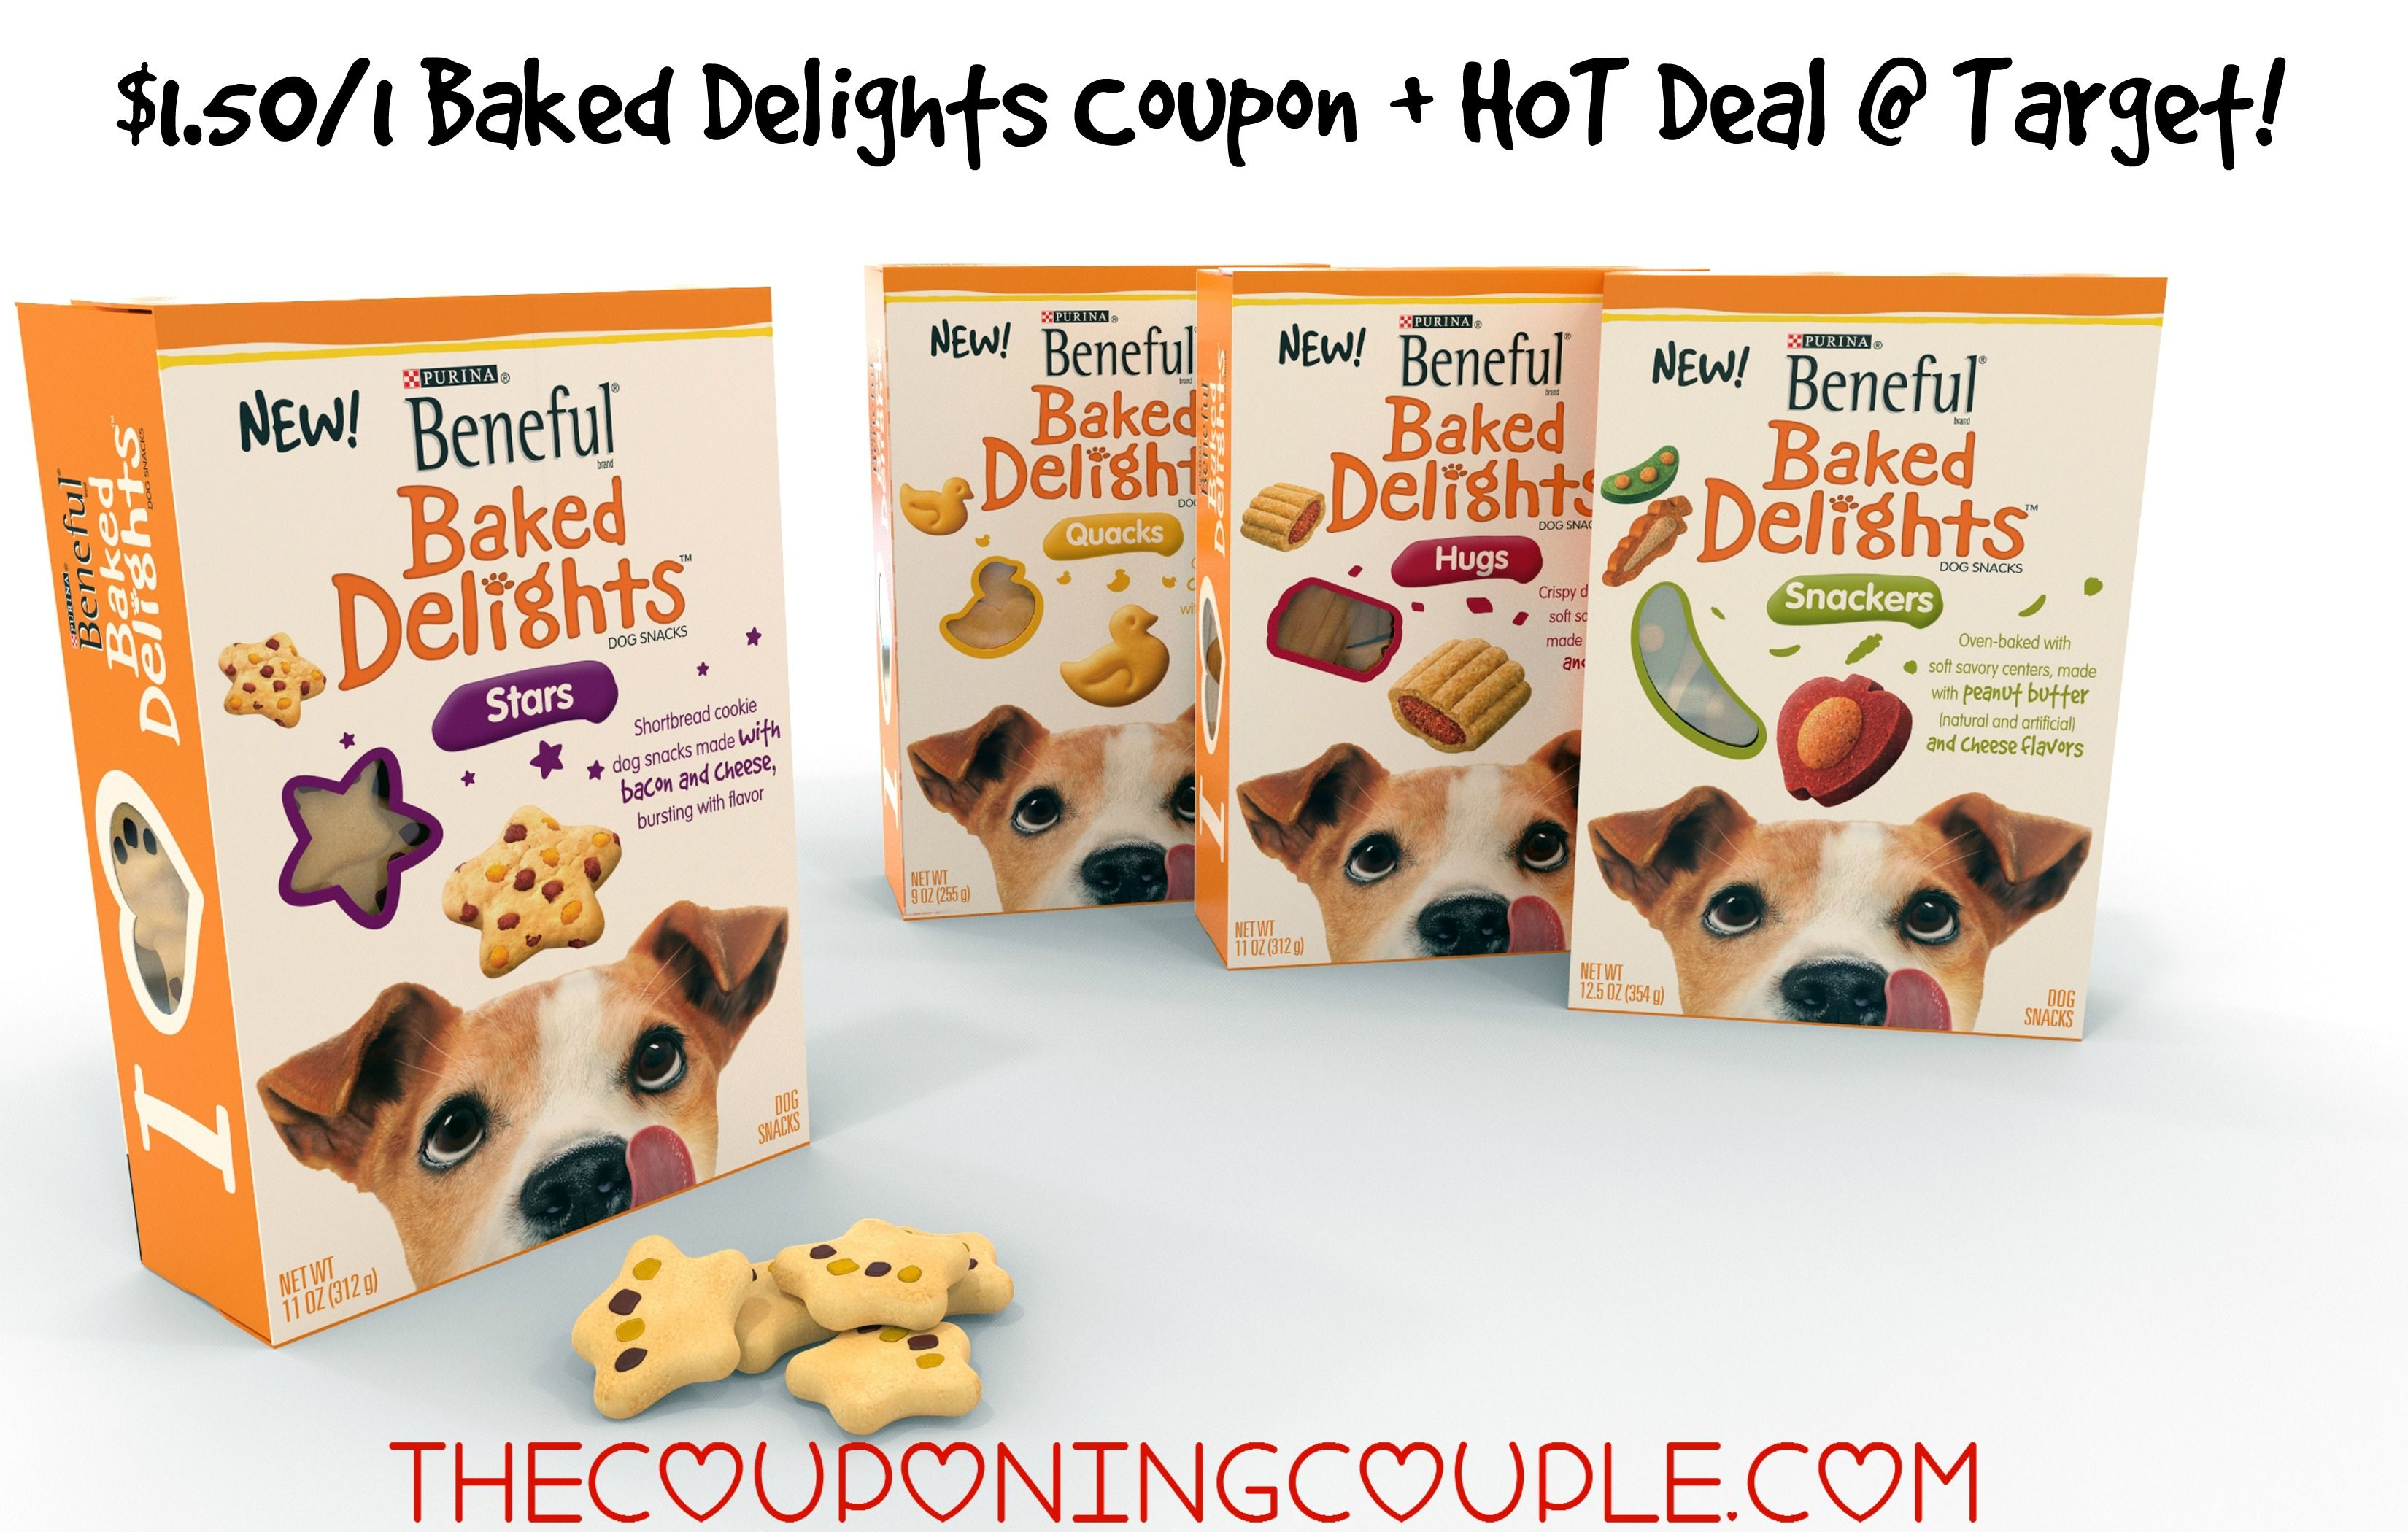 1 50 1 Beneful Baked Delights Coupon Hot Target Deal Target